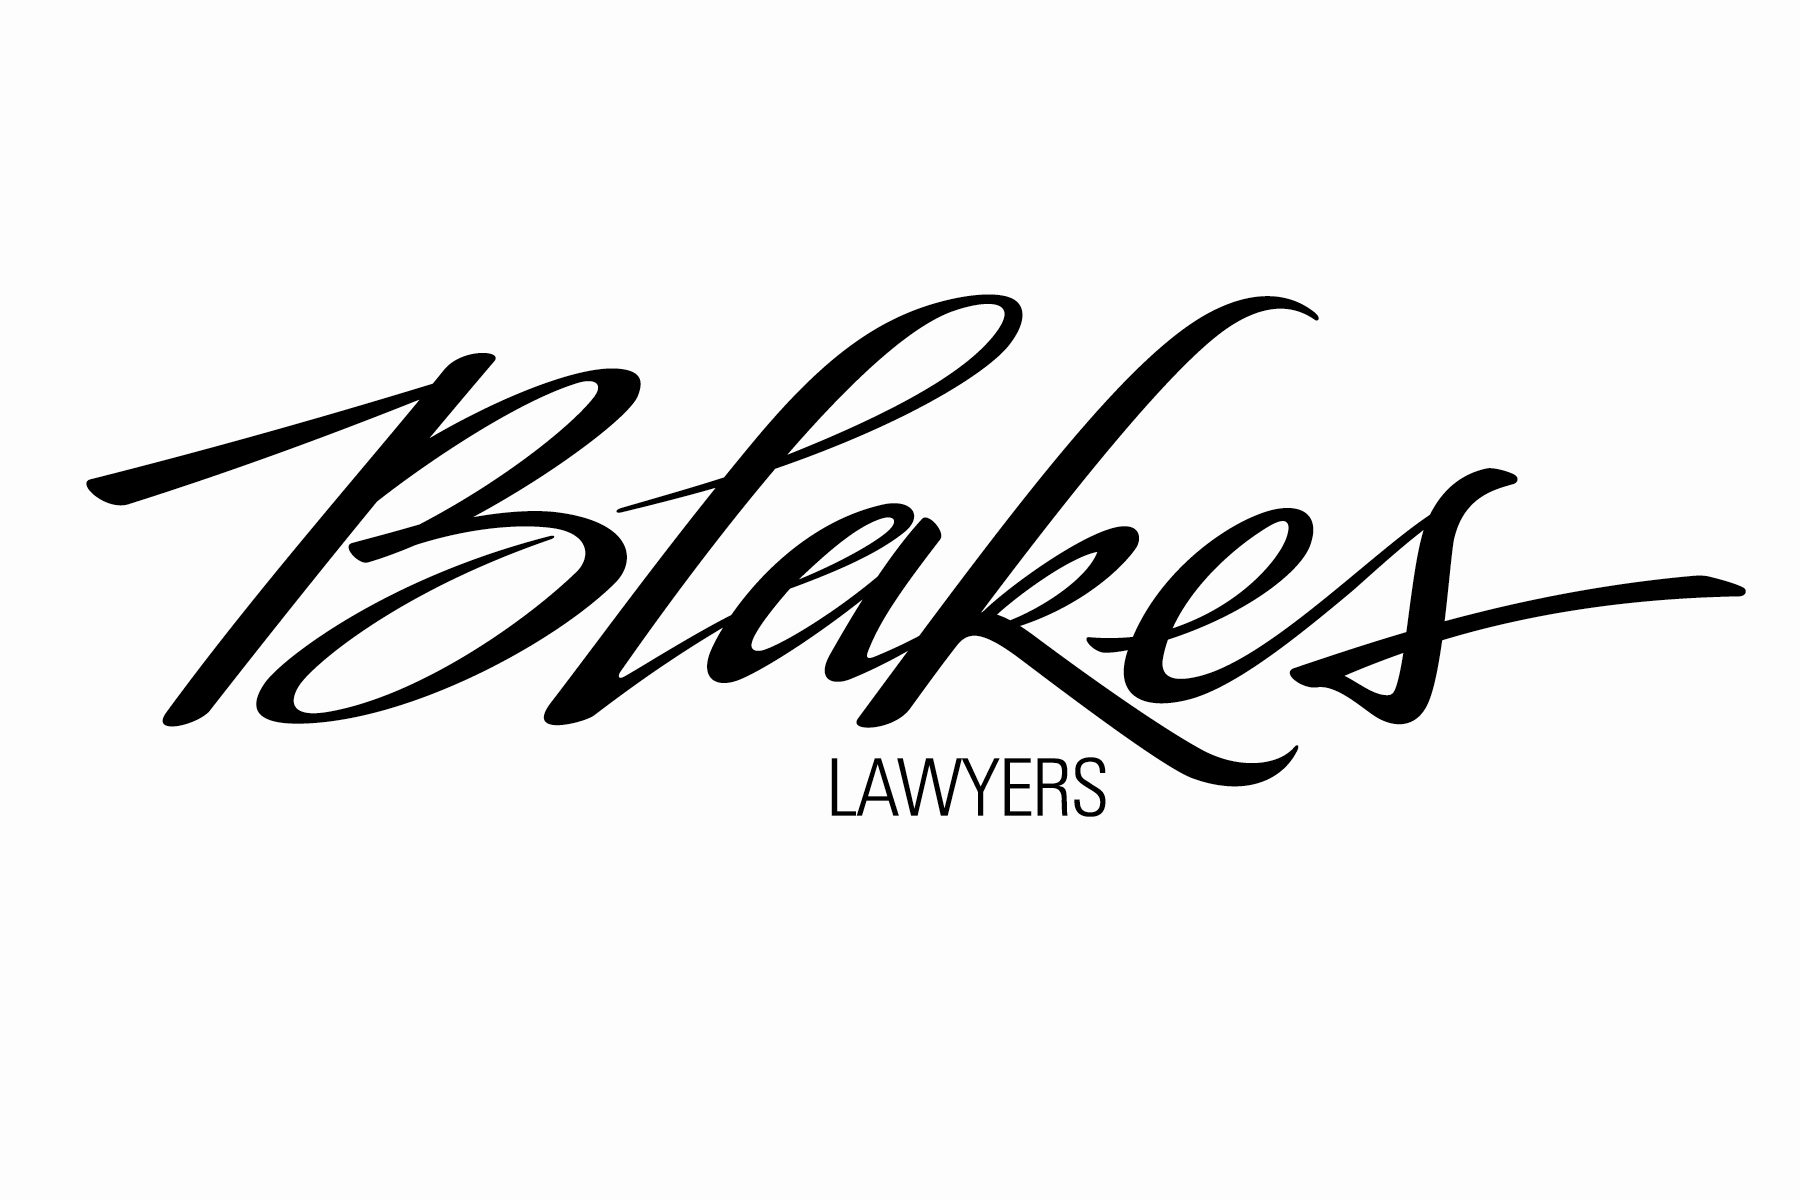 Blakes Logo (Lawyers).JPG